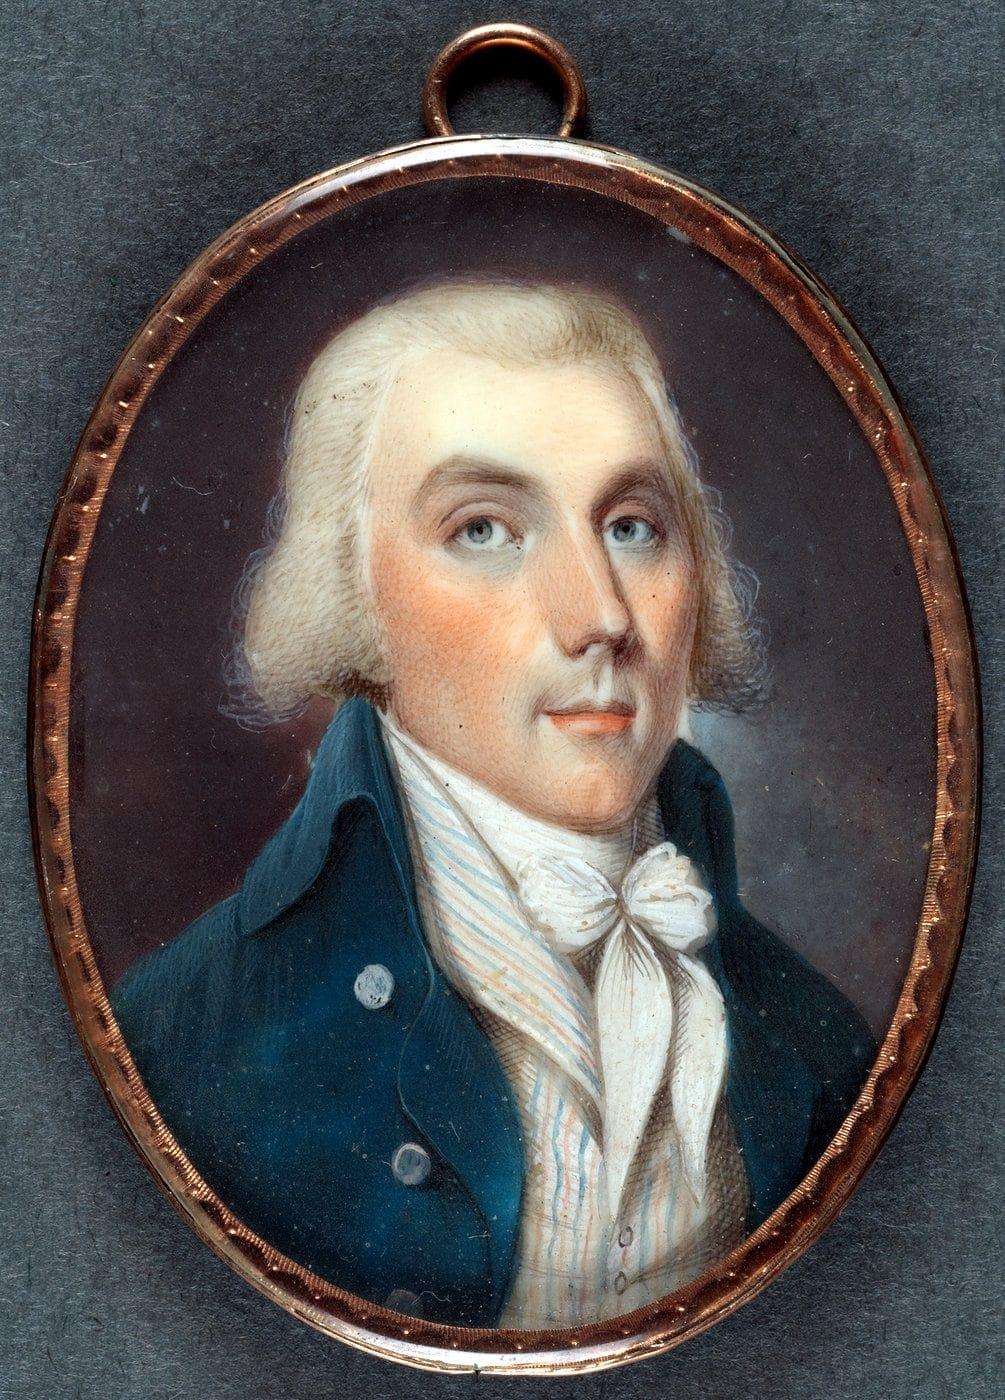 Miniature portrait of Samuel S. Forman (1790)